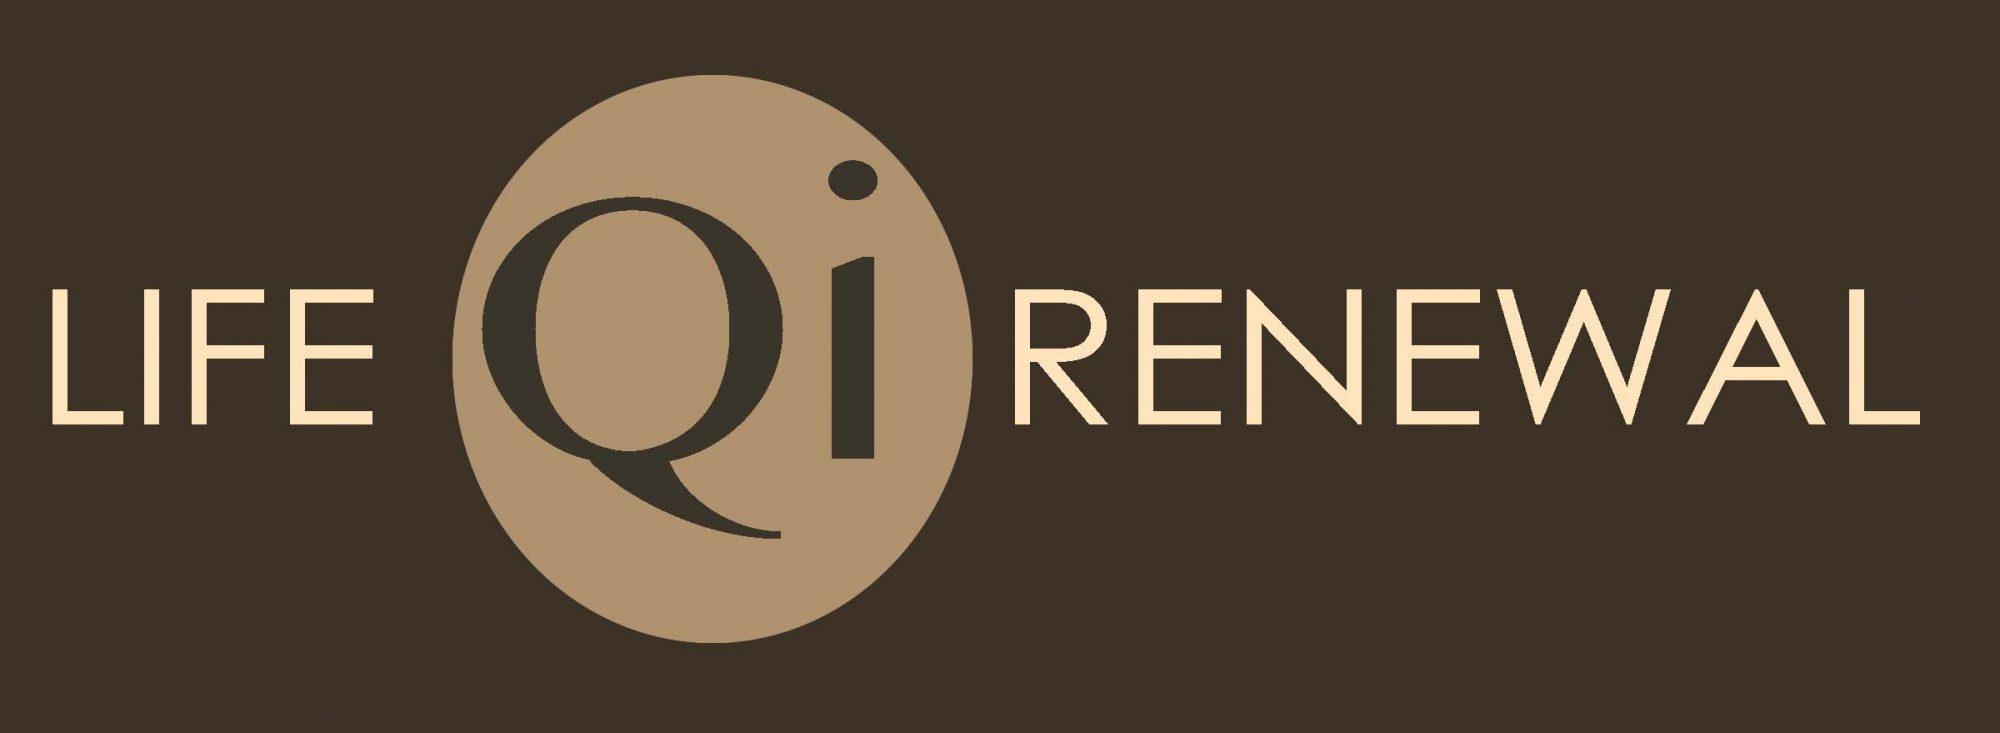 Life Qi Renewal